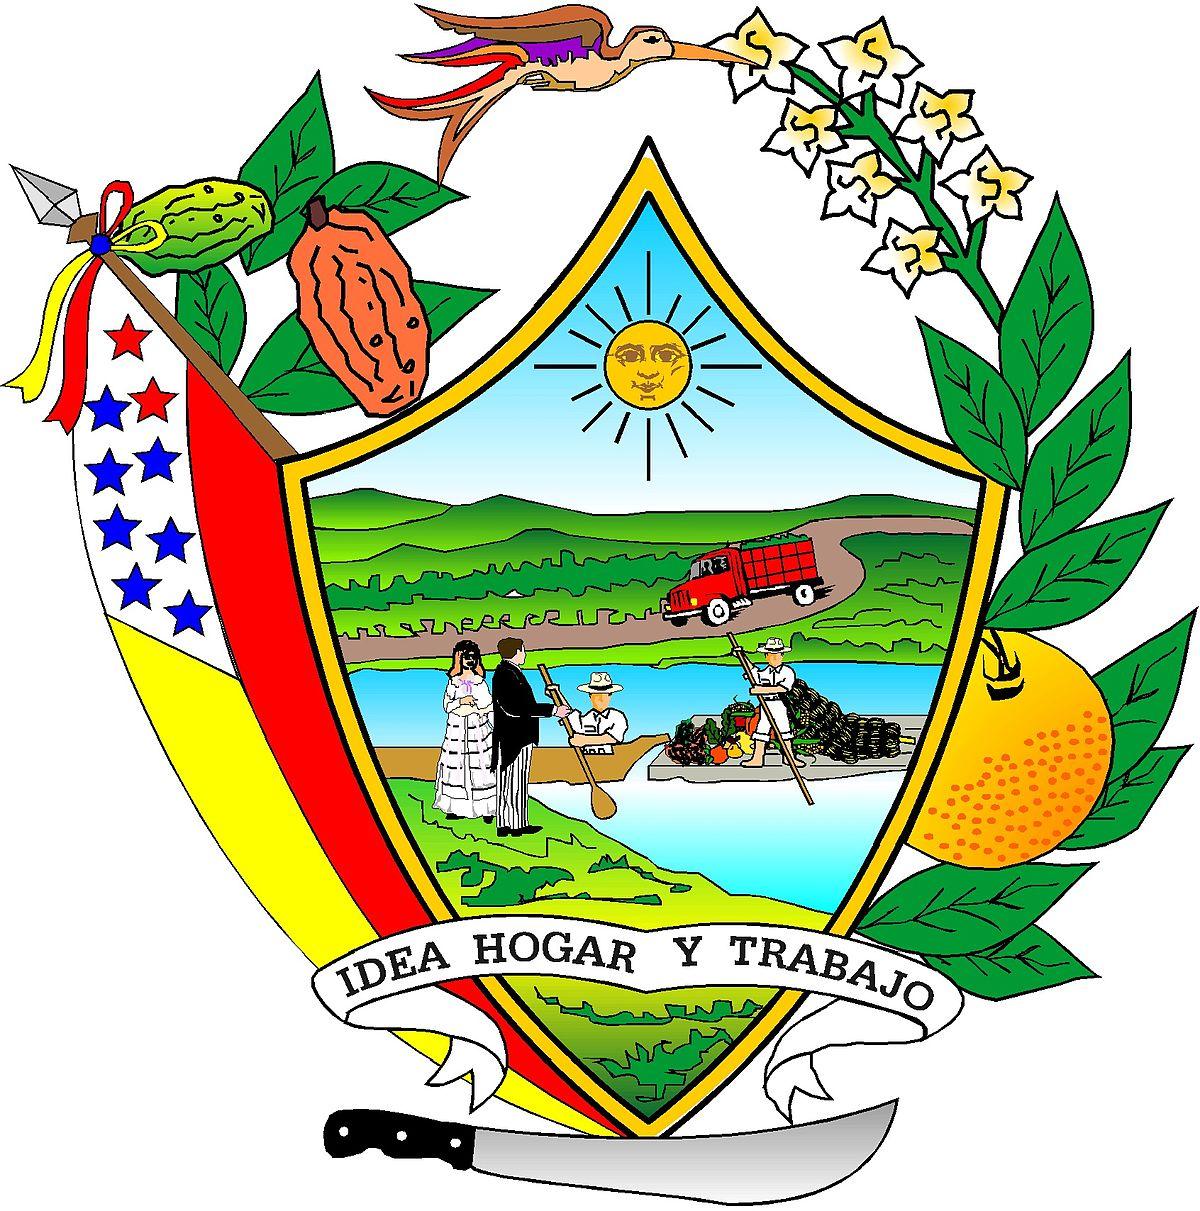 Escudo de Chone - Wikipedia, la enciclopedia libre